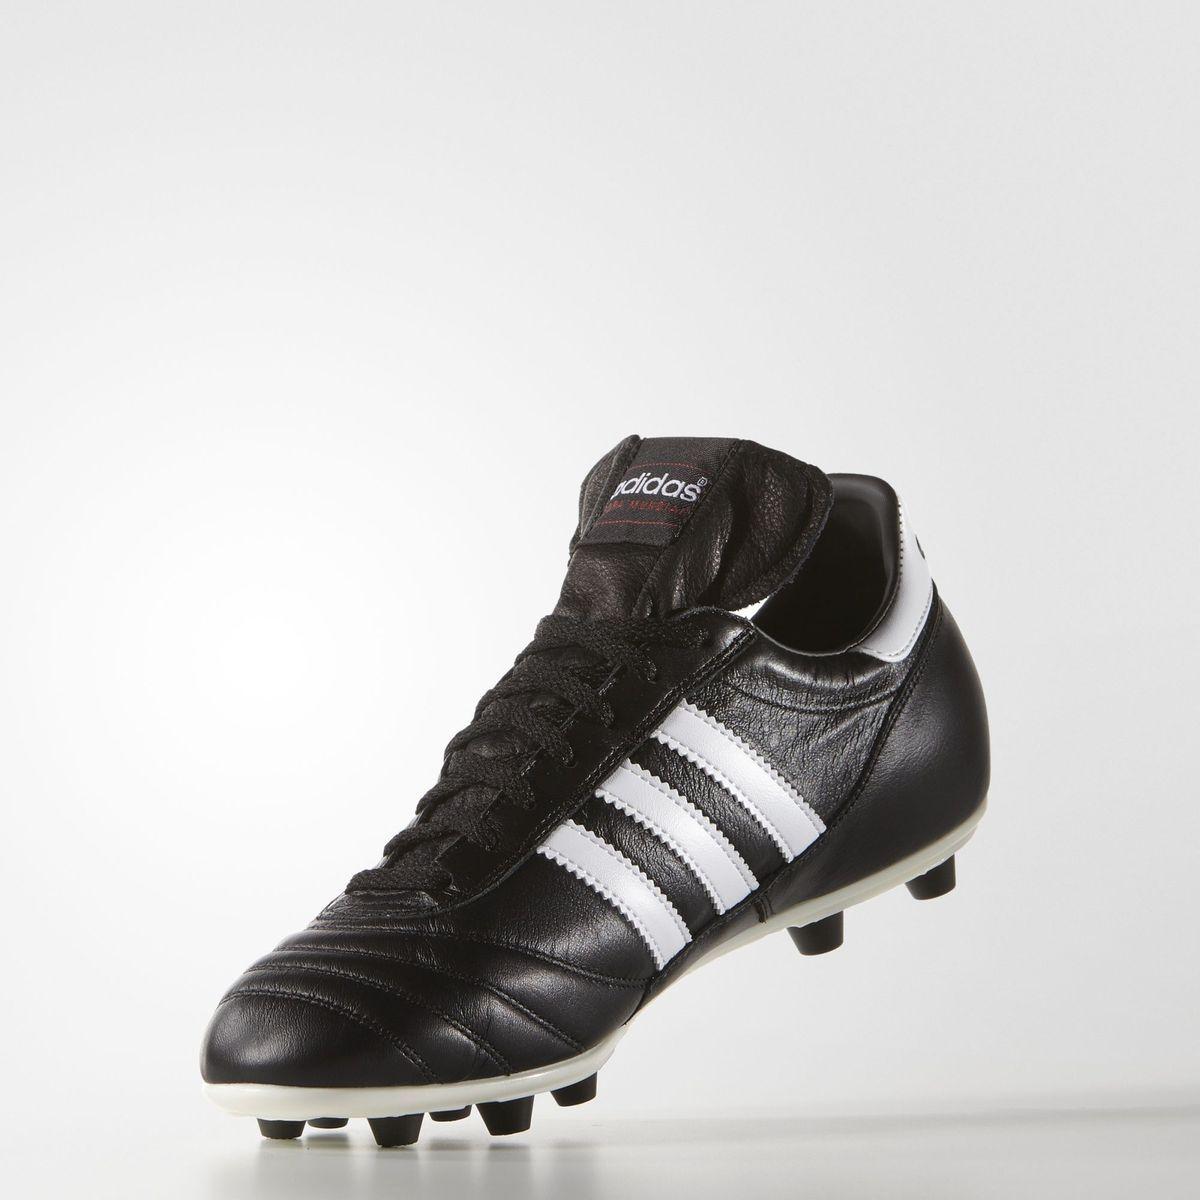 chaussures de football homme adidas copa mondial